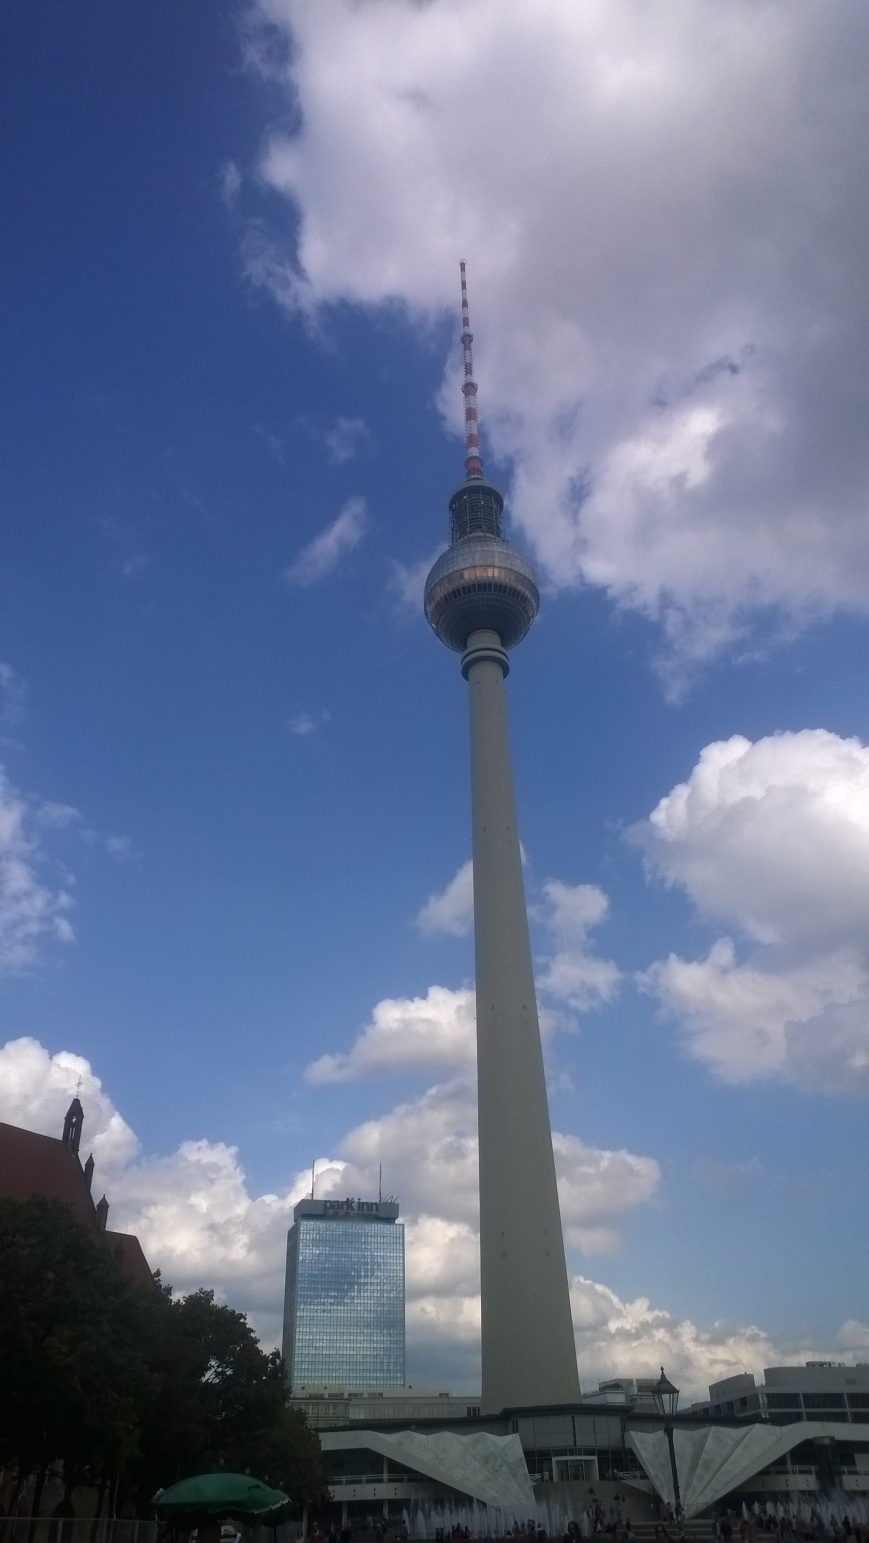 Alex, Berlin - Emma's Picture Postcards